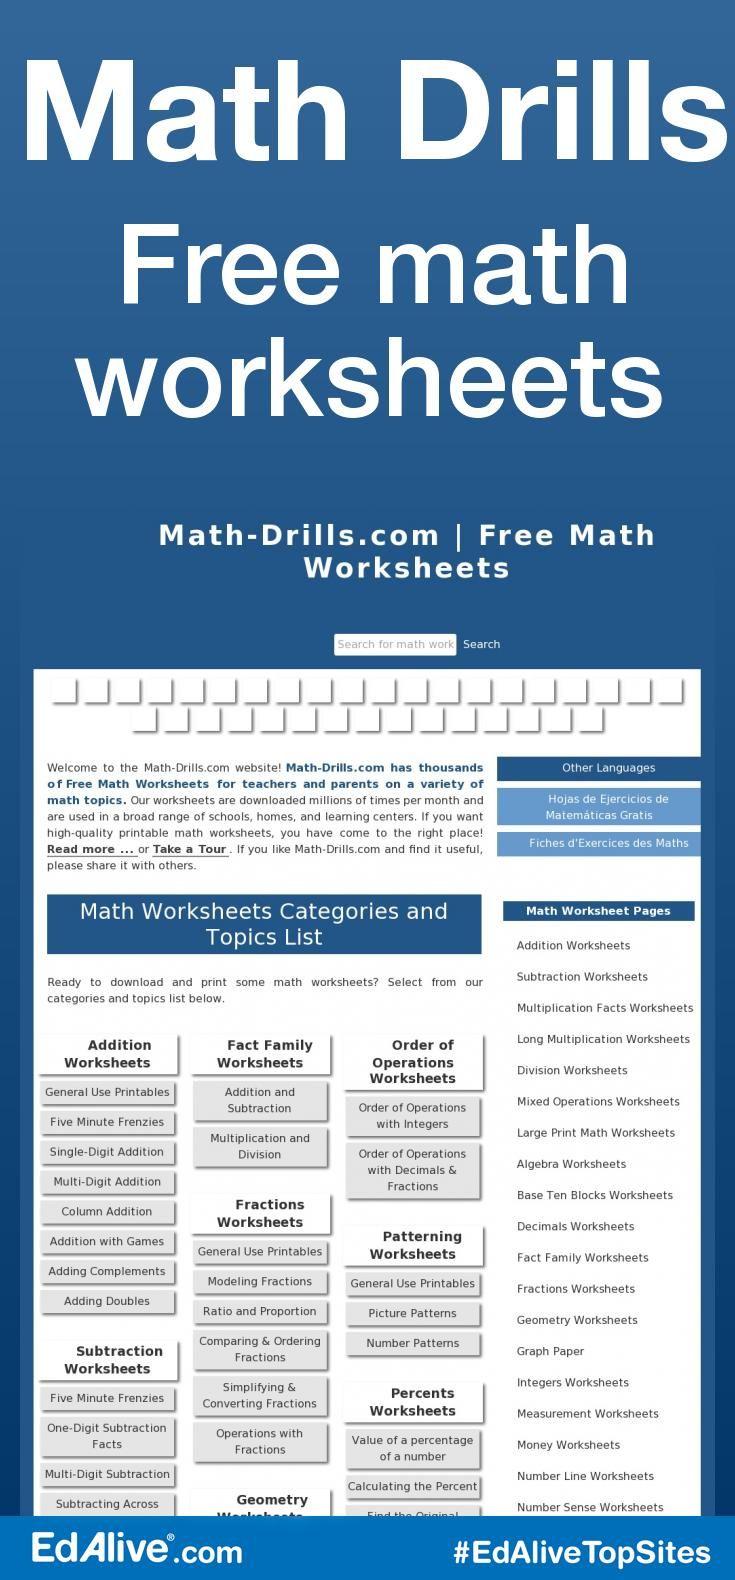 Math Drills | Printable maths worksheets, Free math worksheets and ...